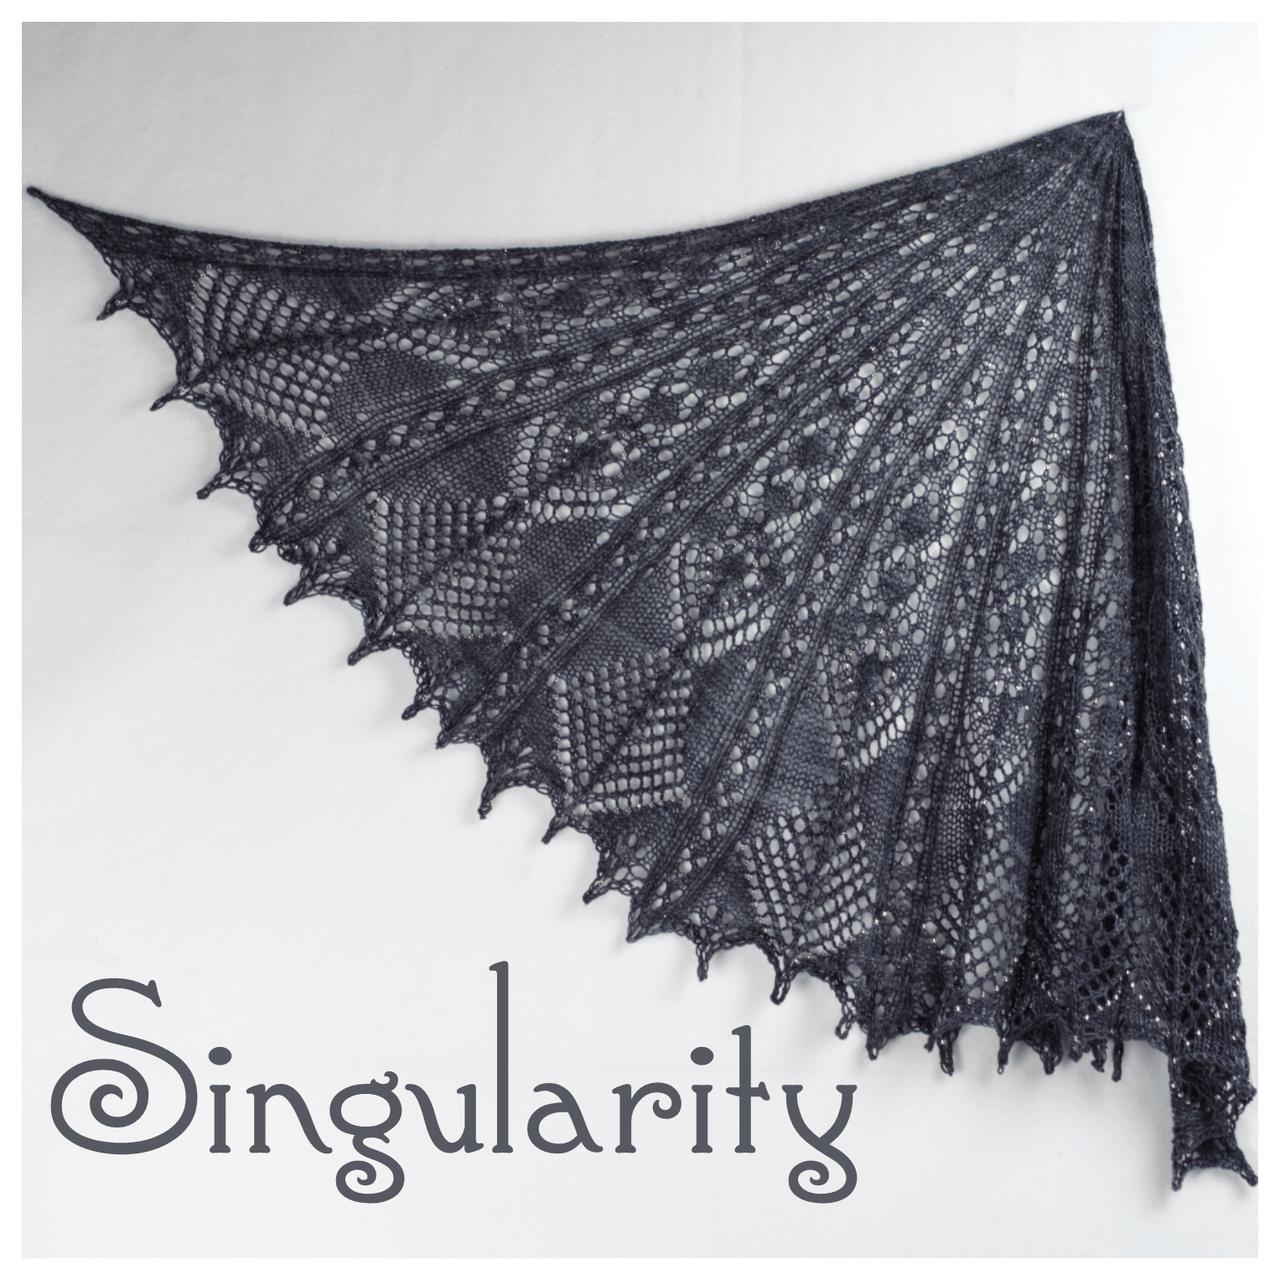 Singularity Twinkle Shawl Kit